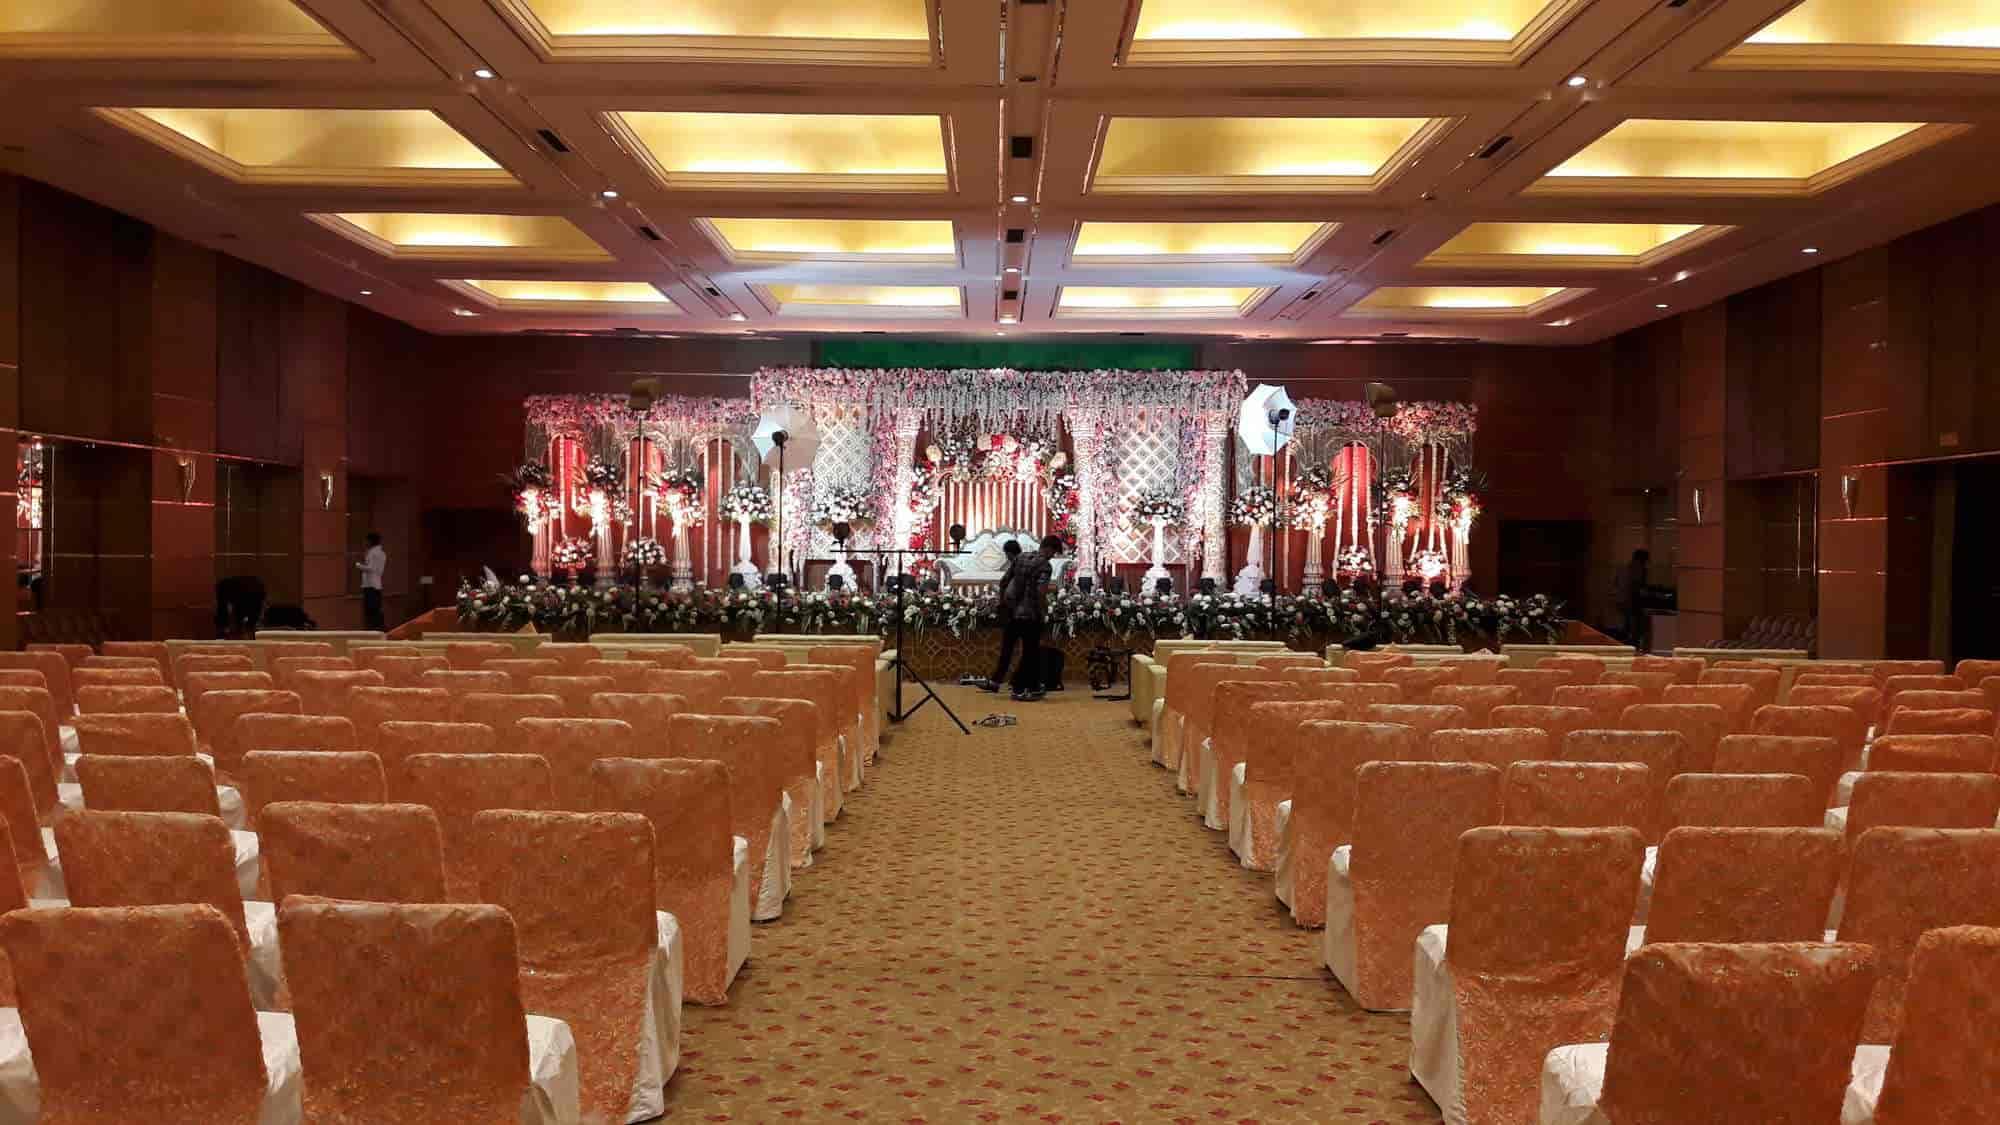 Saroj Tent And Events Tonk Road Banquet Halls In Jaipur Justdial